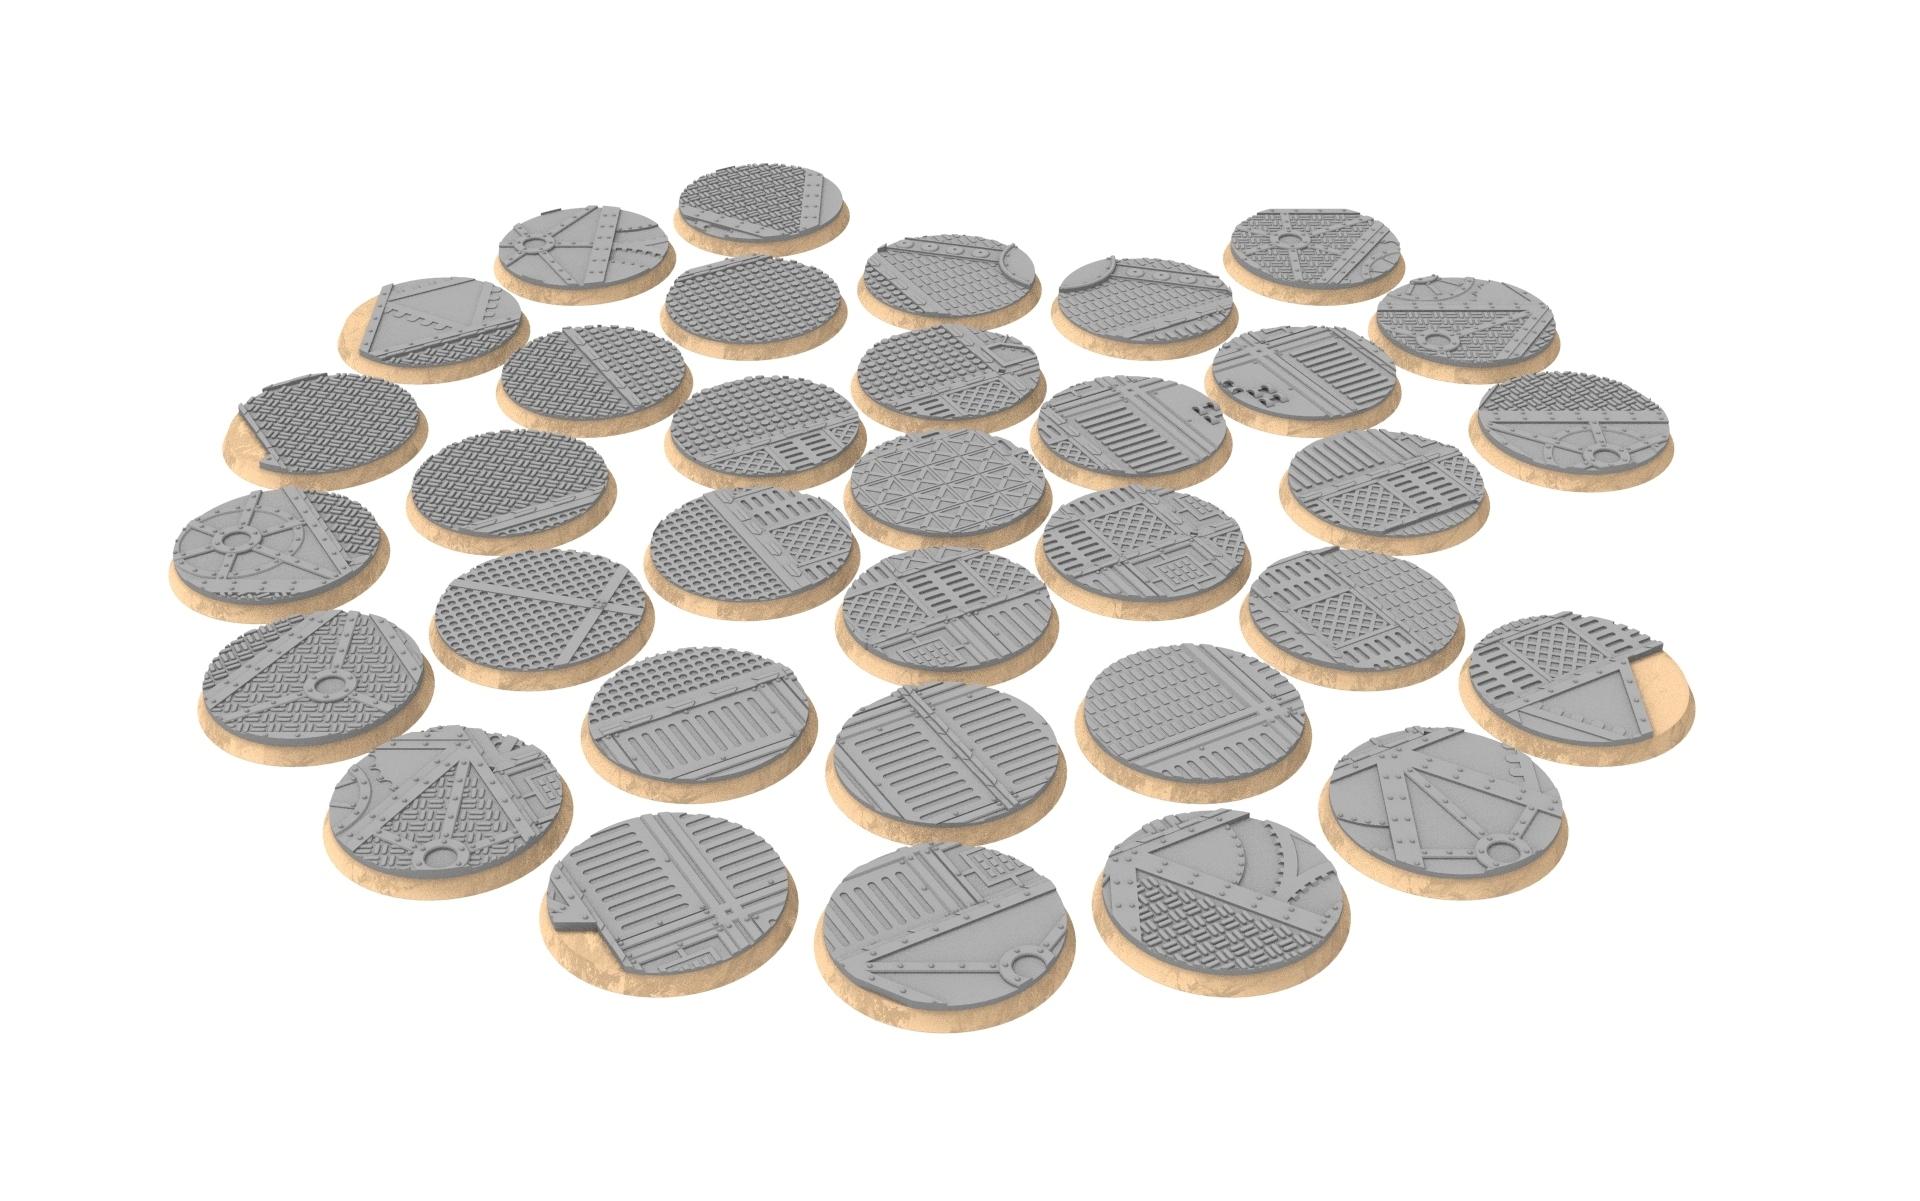 40mm.jpg Download STL file x1000 Round, oval, square, rectangular, hexagonal, industrial textured bases • 3D print design, Alario